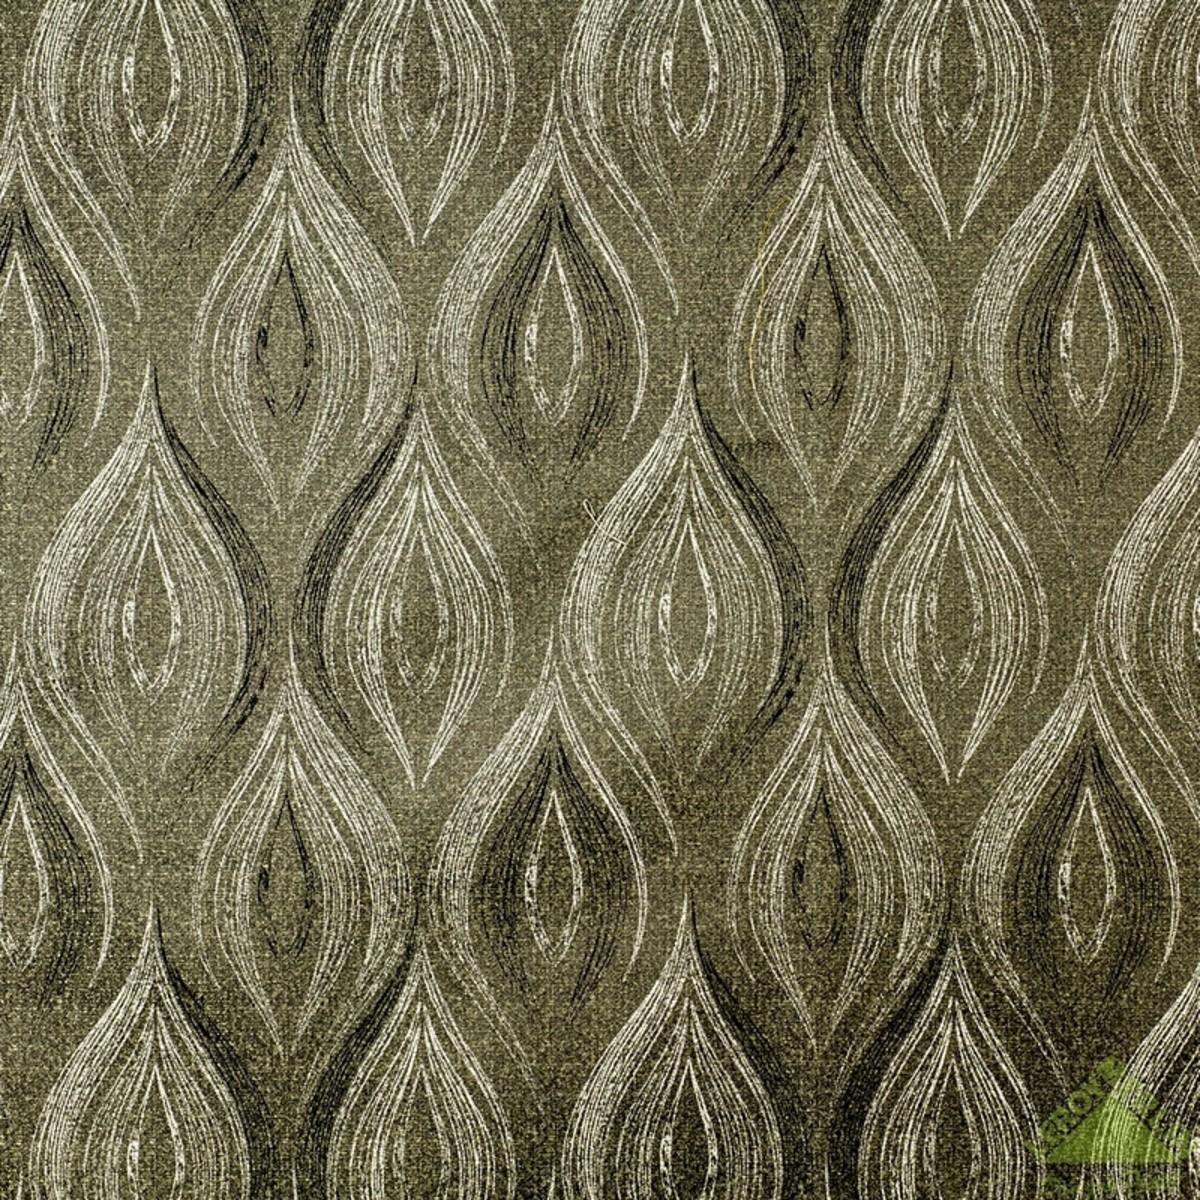 Ткань Латтэ 156 см жаккард серый 1 пог. м